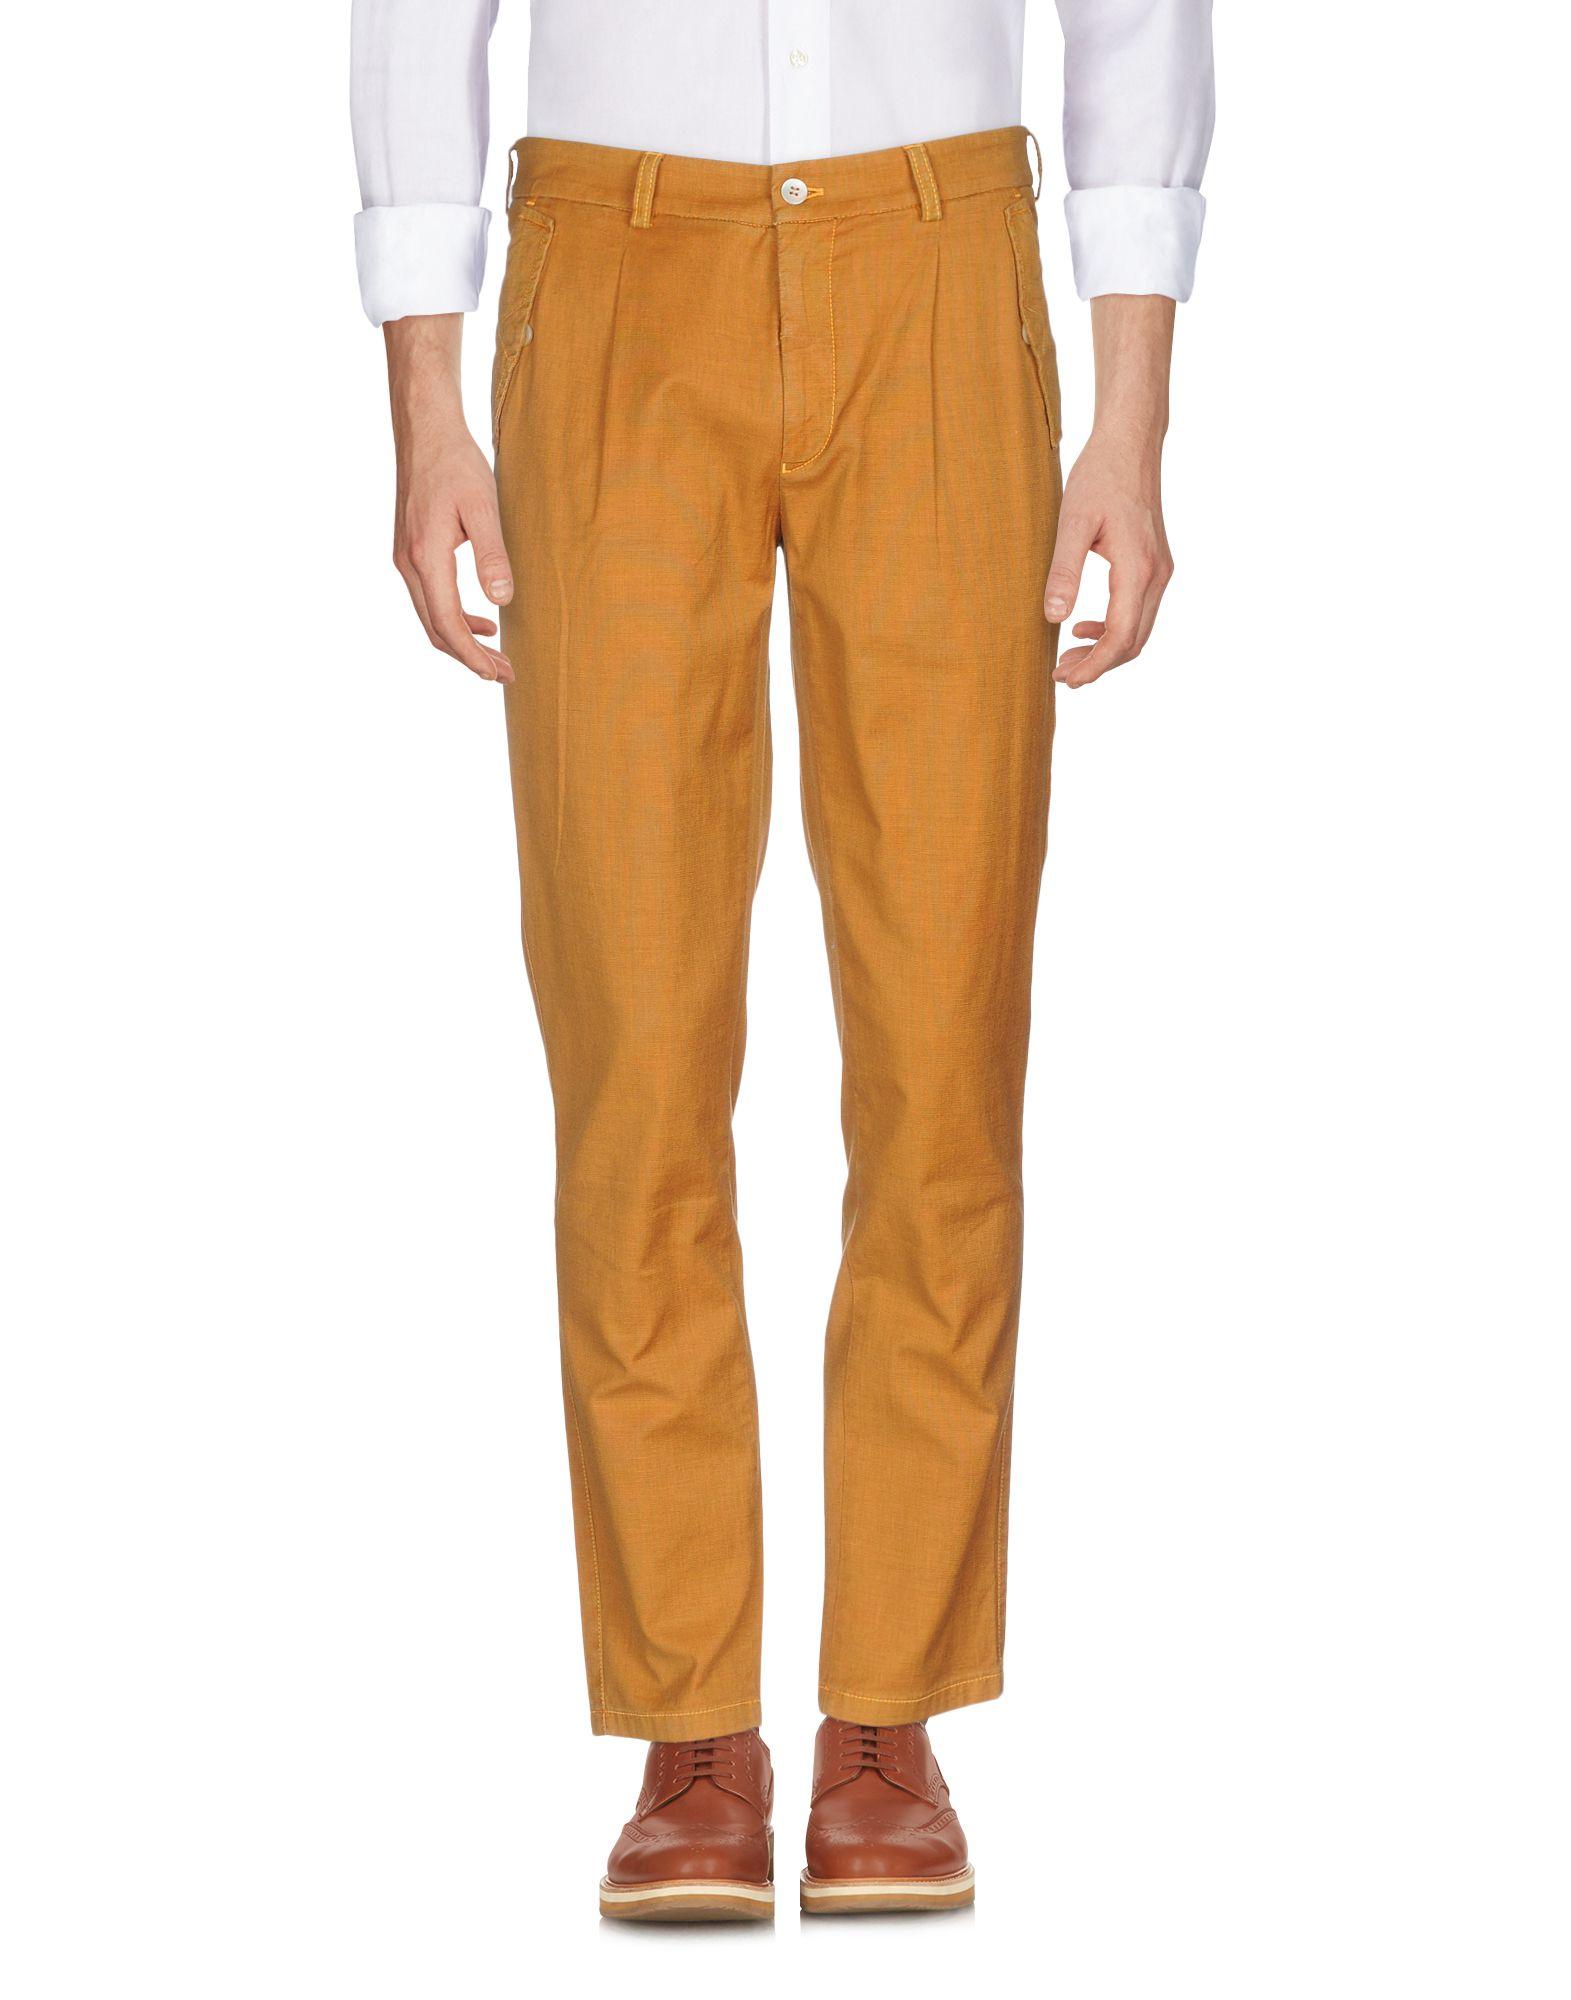 online Acquista Versace Pantalone su Uomo 6wtPYz